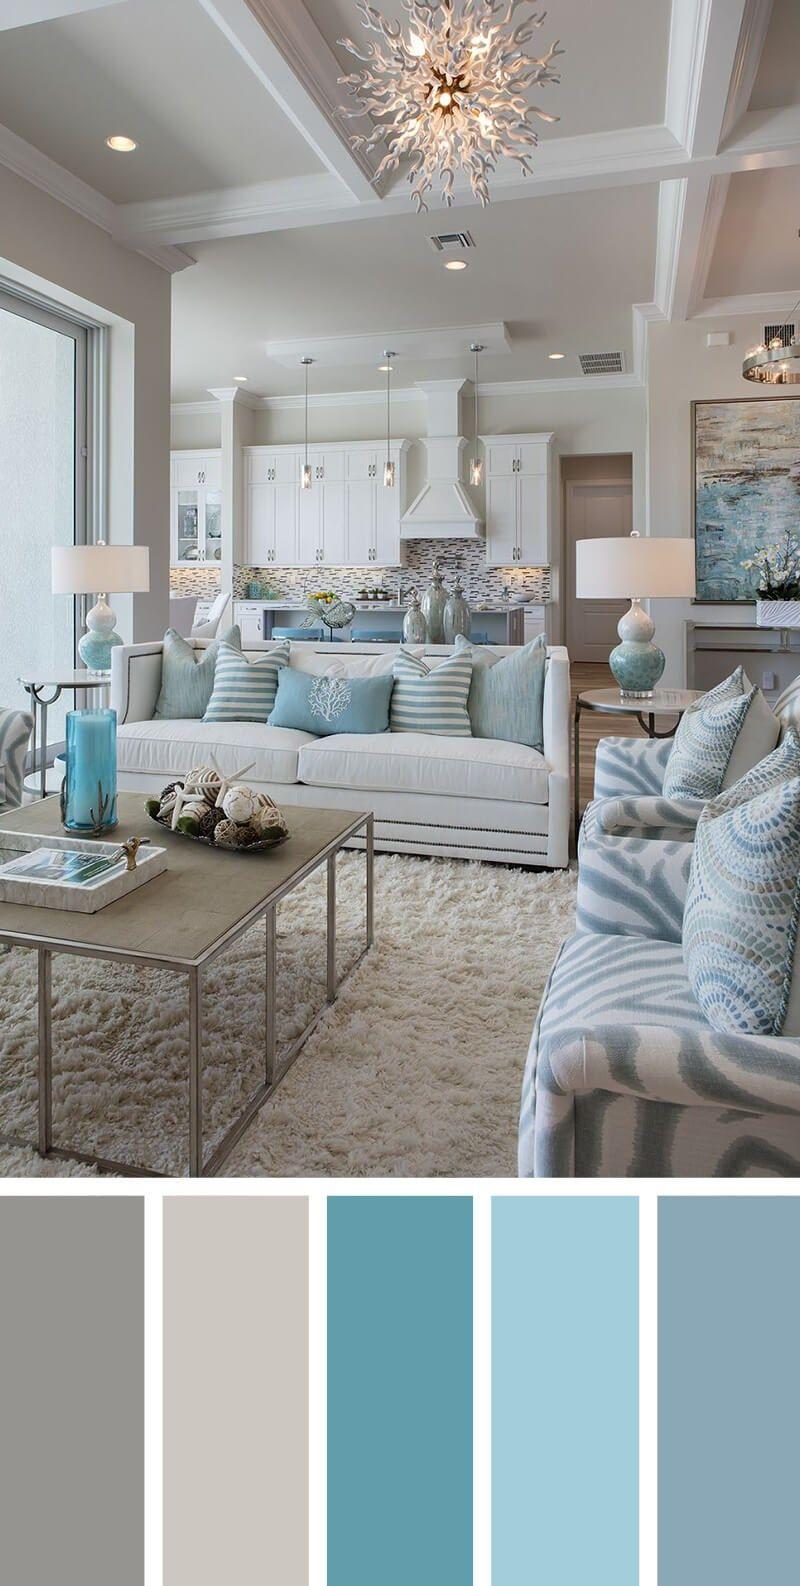 Best Photo Of Living Room Paint Color Interior Design Ideas Home Decorating Inspiration Moercar Apartment Living Room Design Farm House Living Room Paint Colors For Living Room